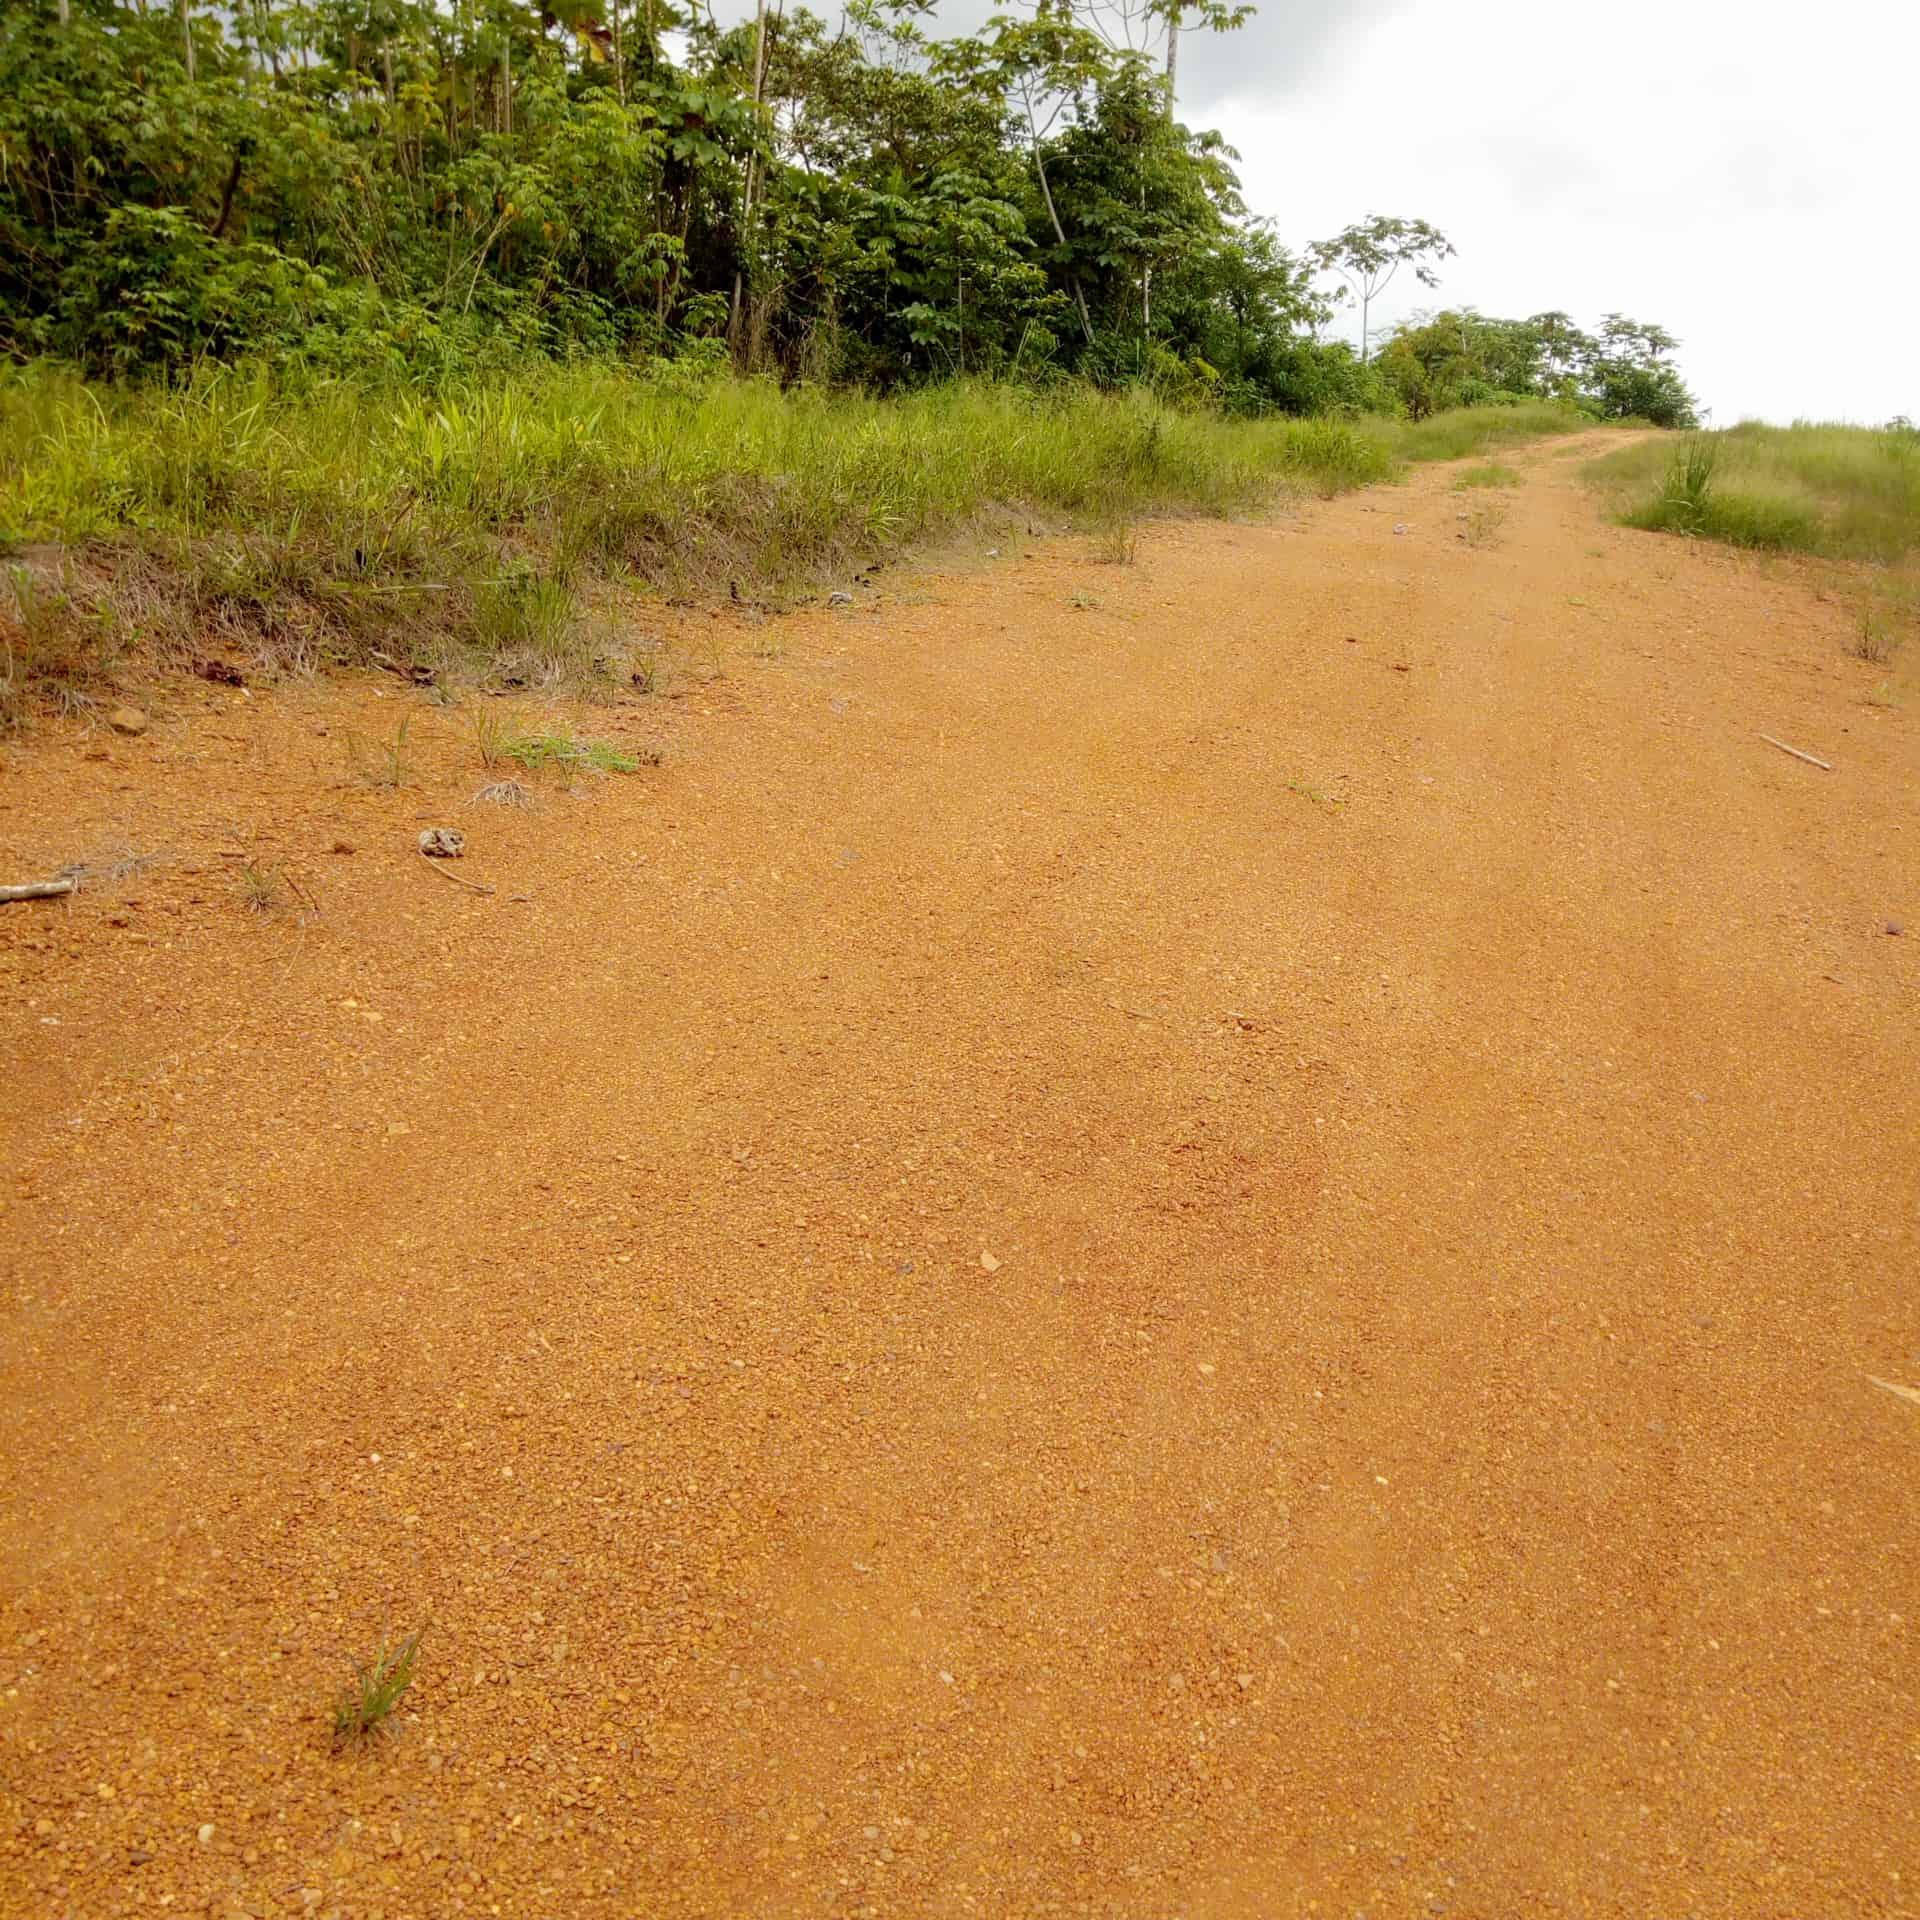 Land for sale at Douala, Lendi, Lendi - 350000 m2 - 6 000 000 FCFA